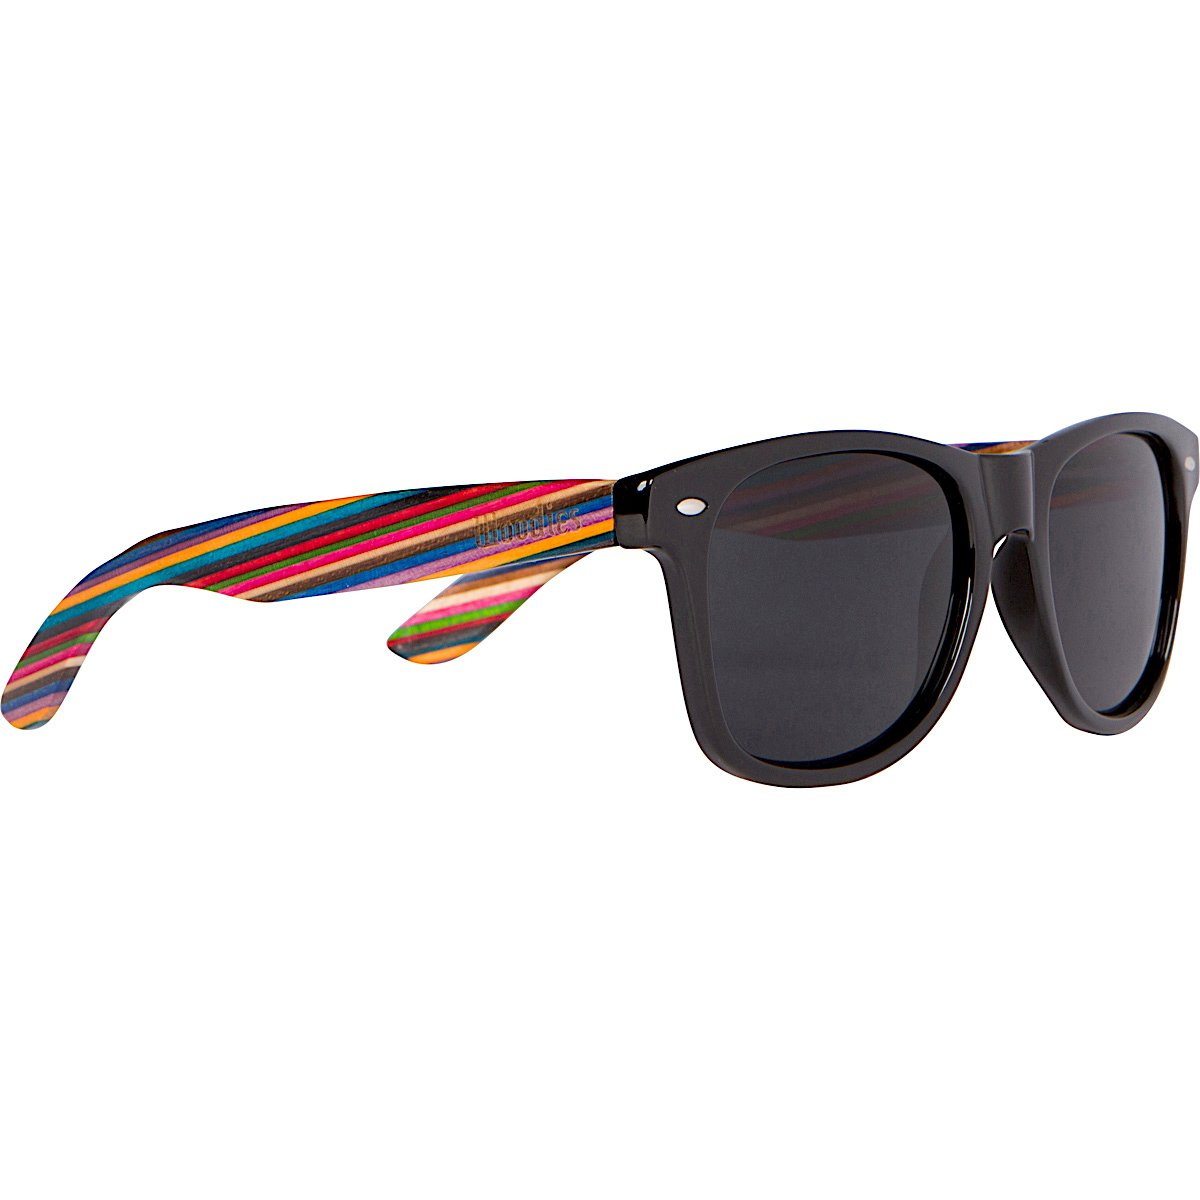 WOODIES Rainbow Wood Wayfarer Sunglasses with Black Polarized Lenses